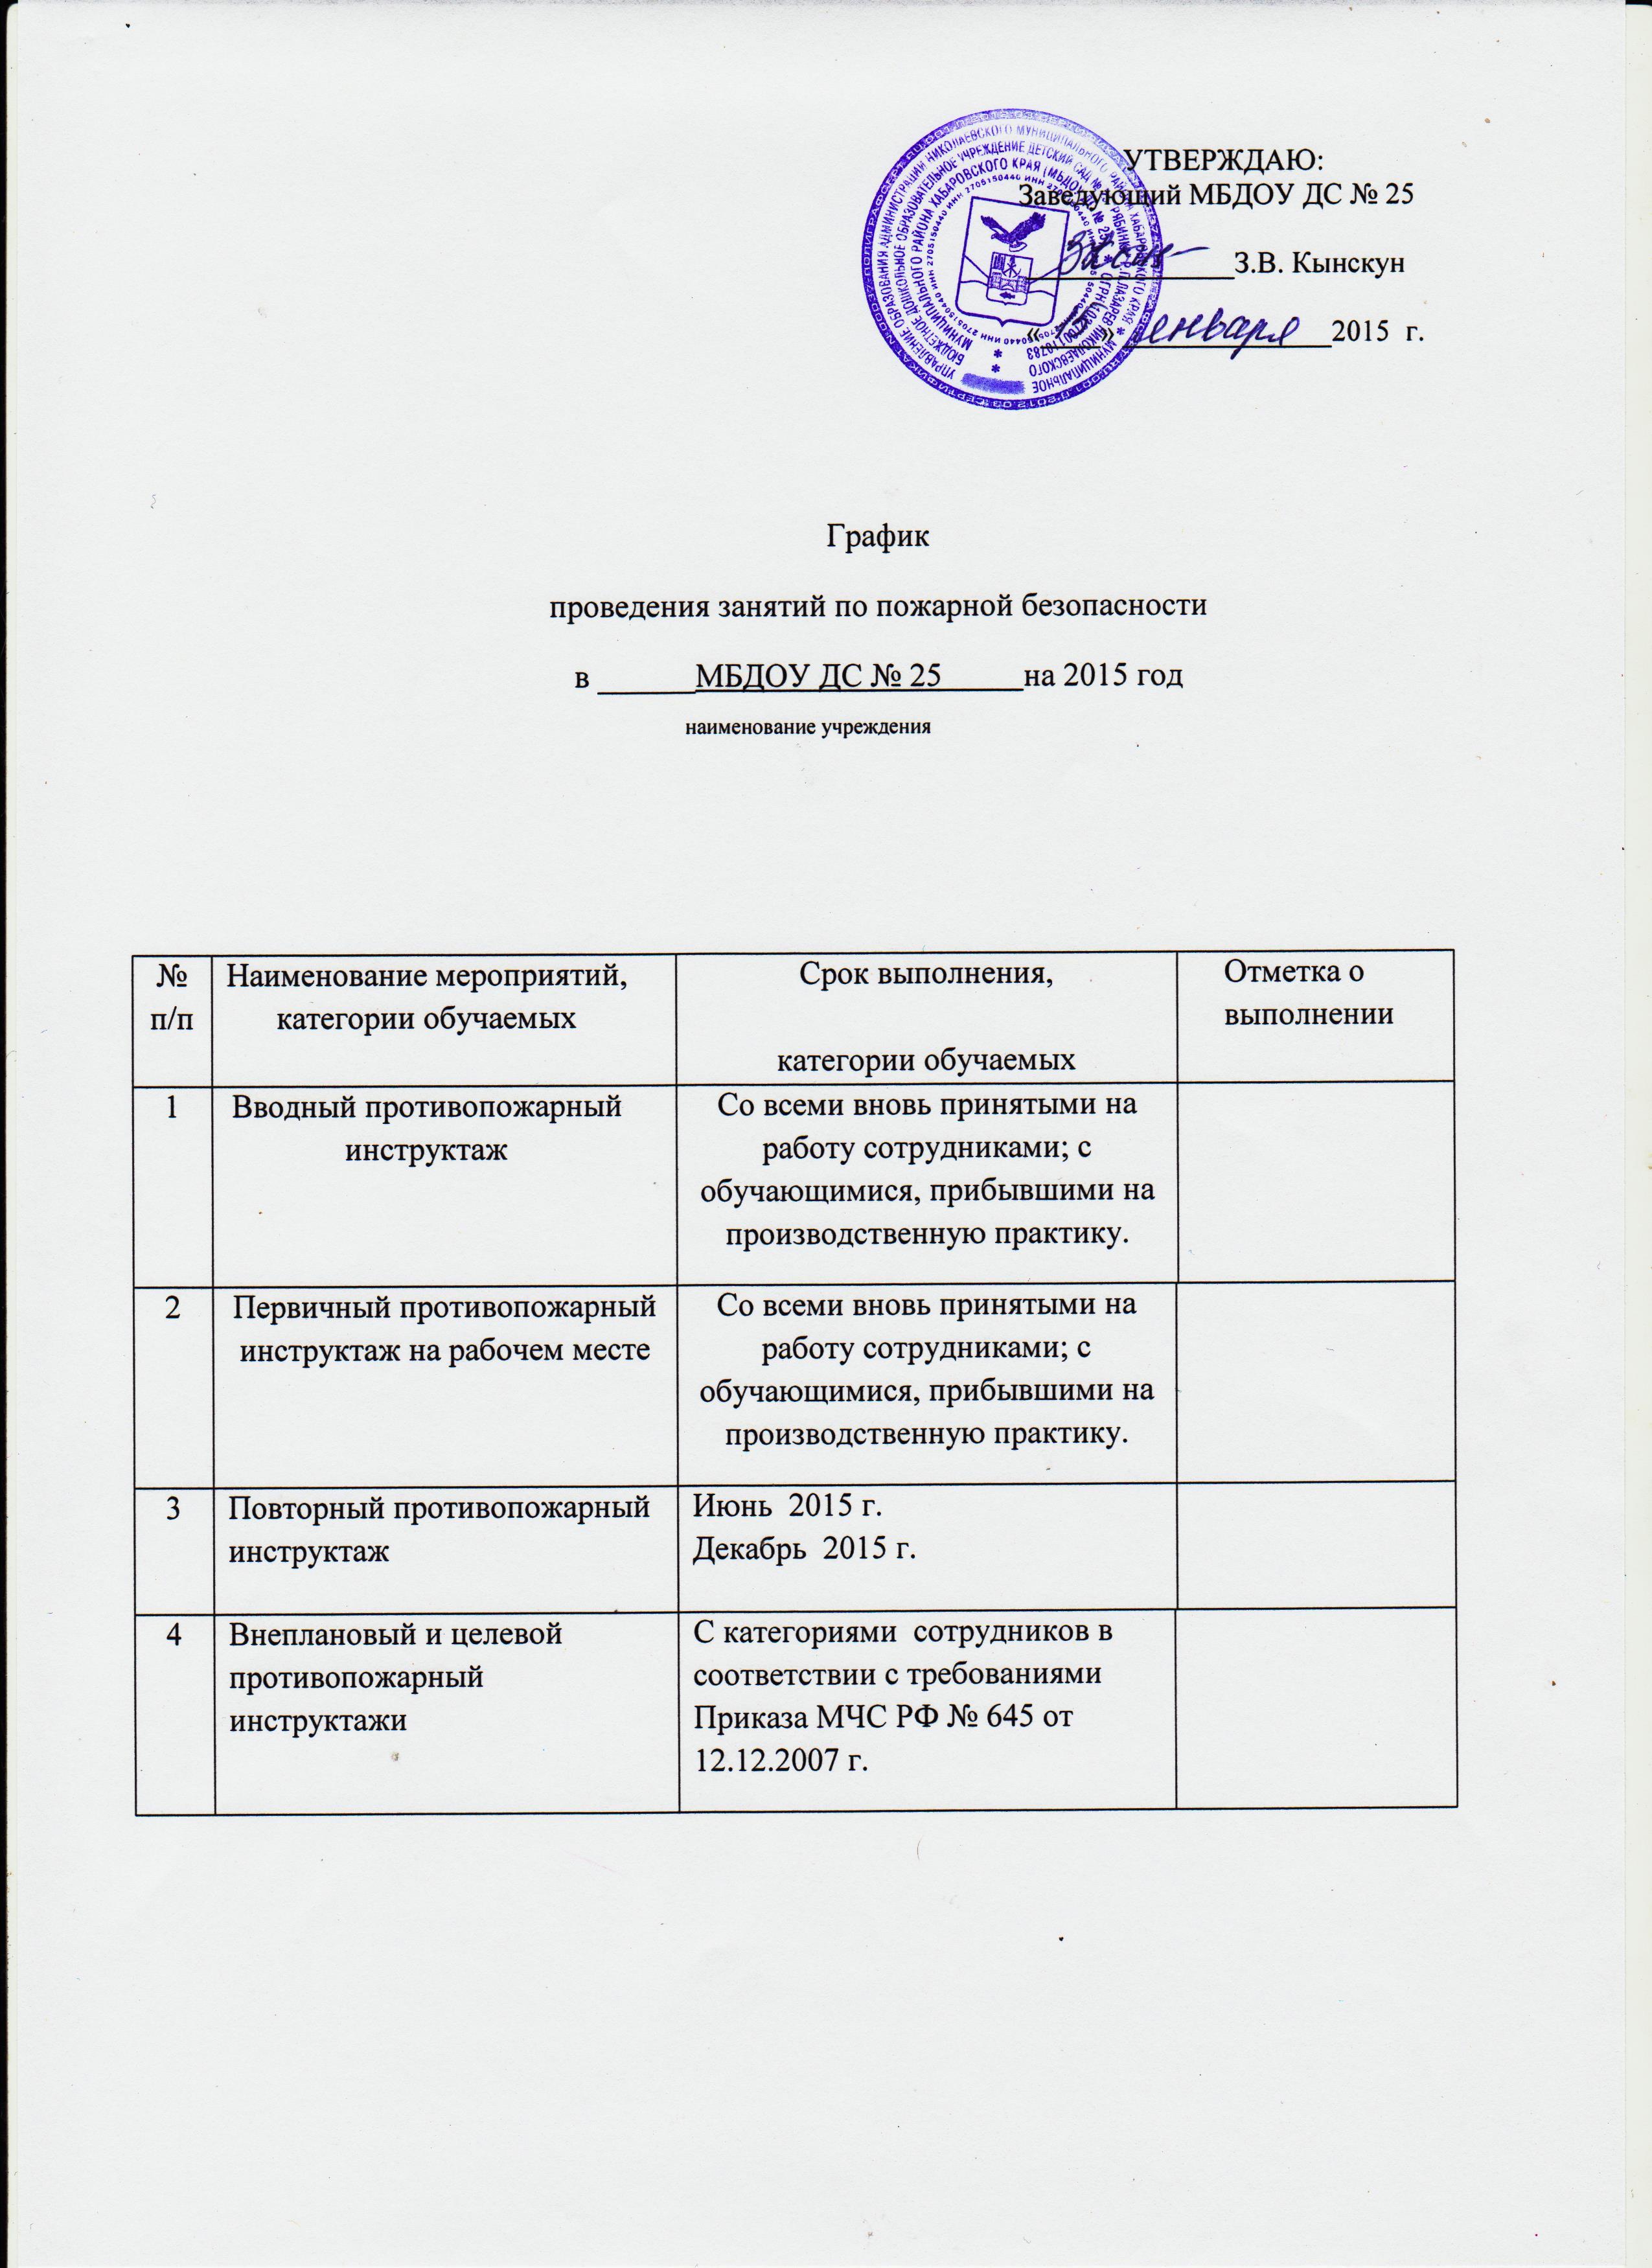 Программу вводного противопожарного инструктажа 2015